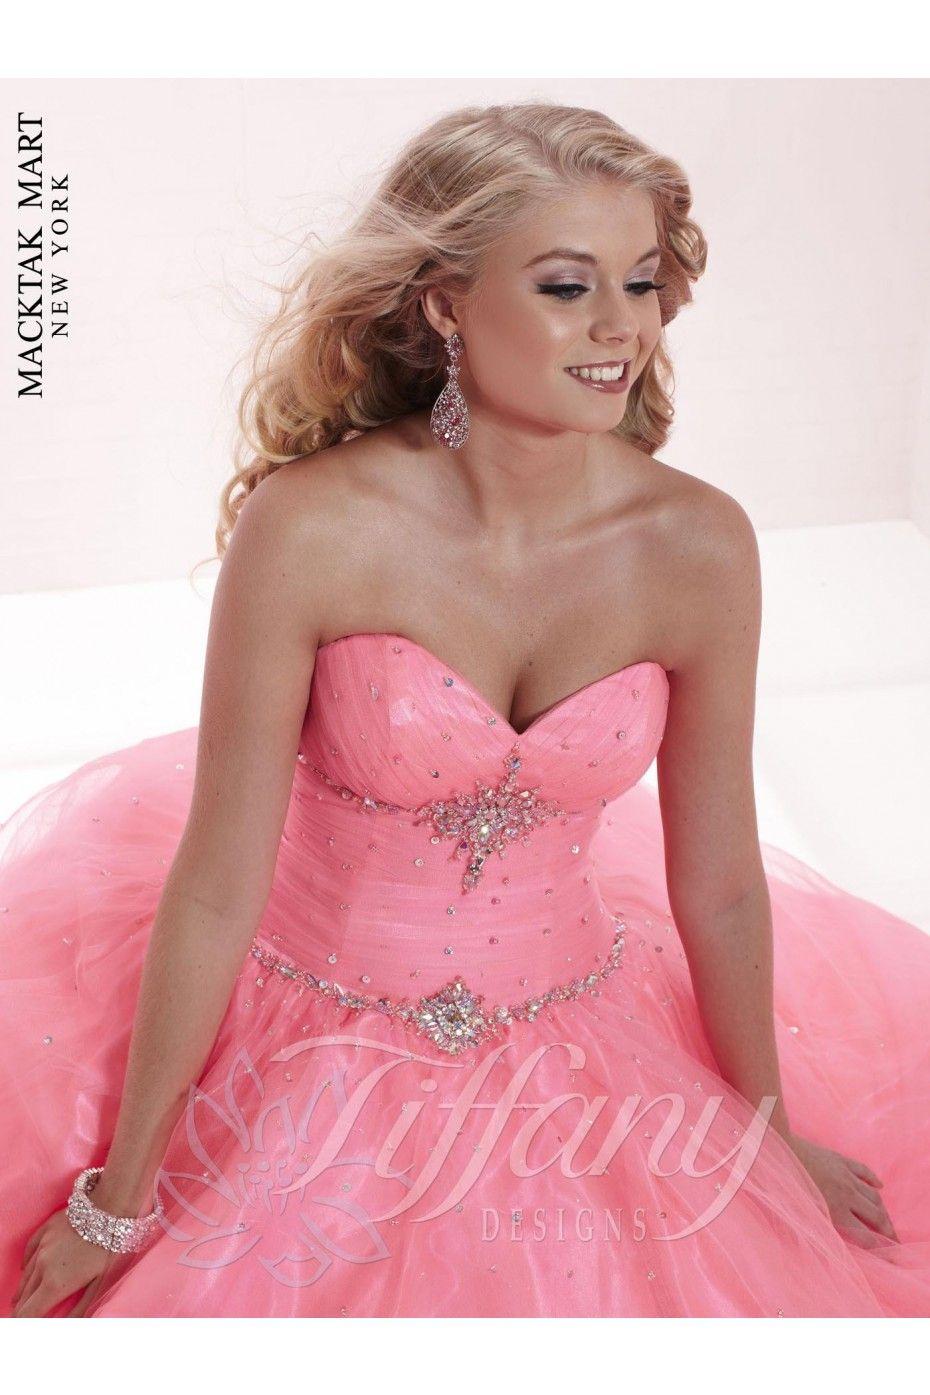 Pin de Renee Pink en Fairytale Pink Dresses | Pinterest